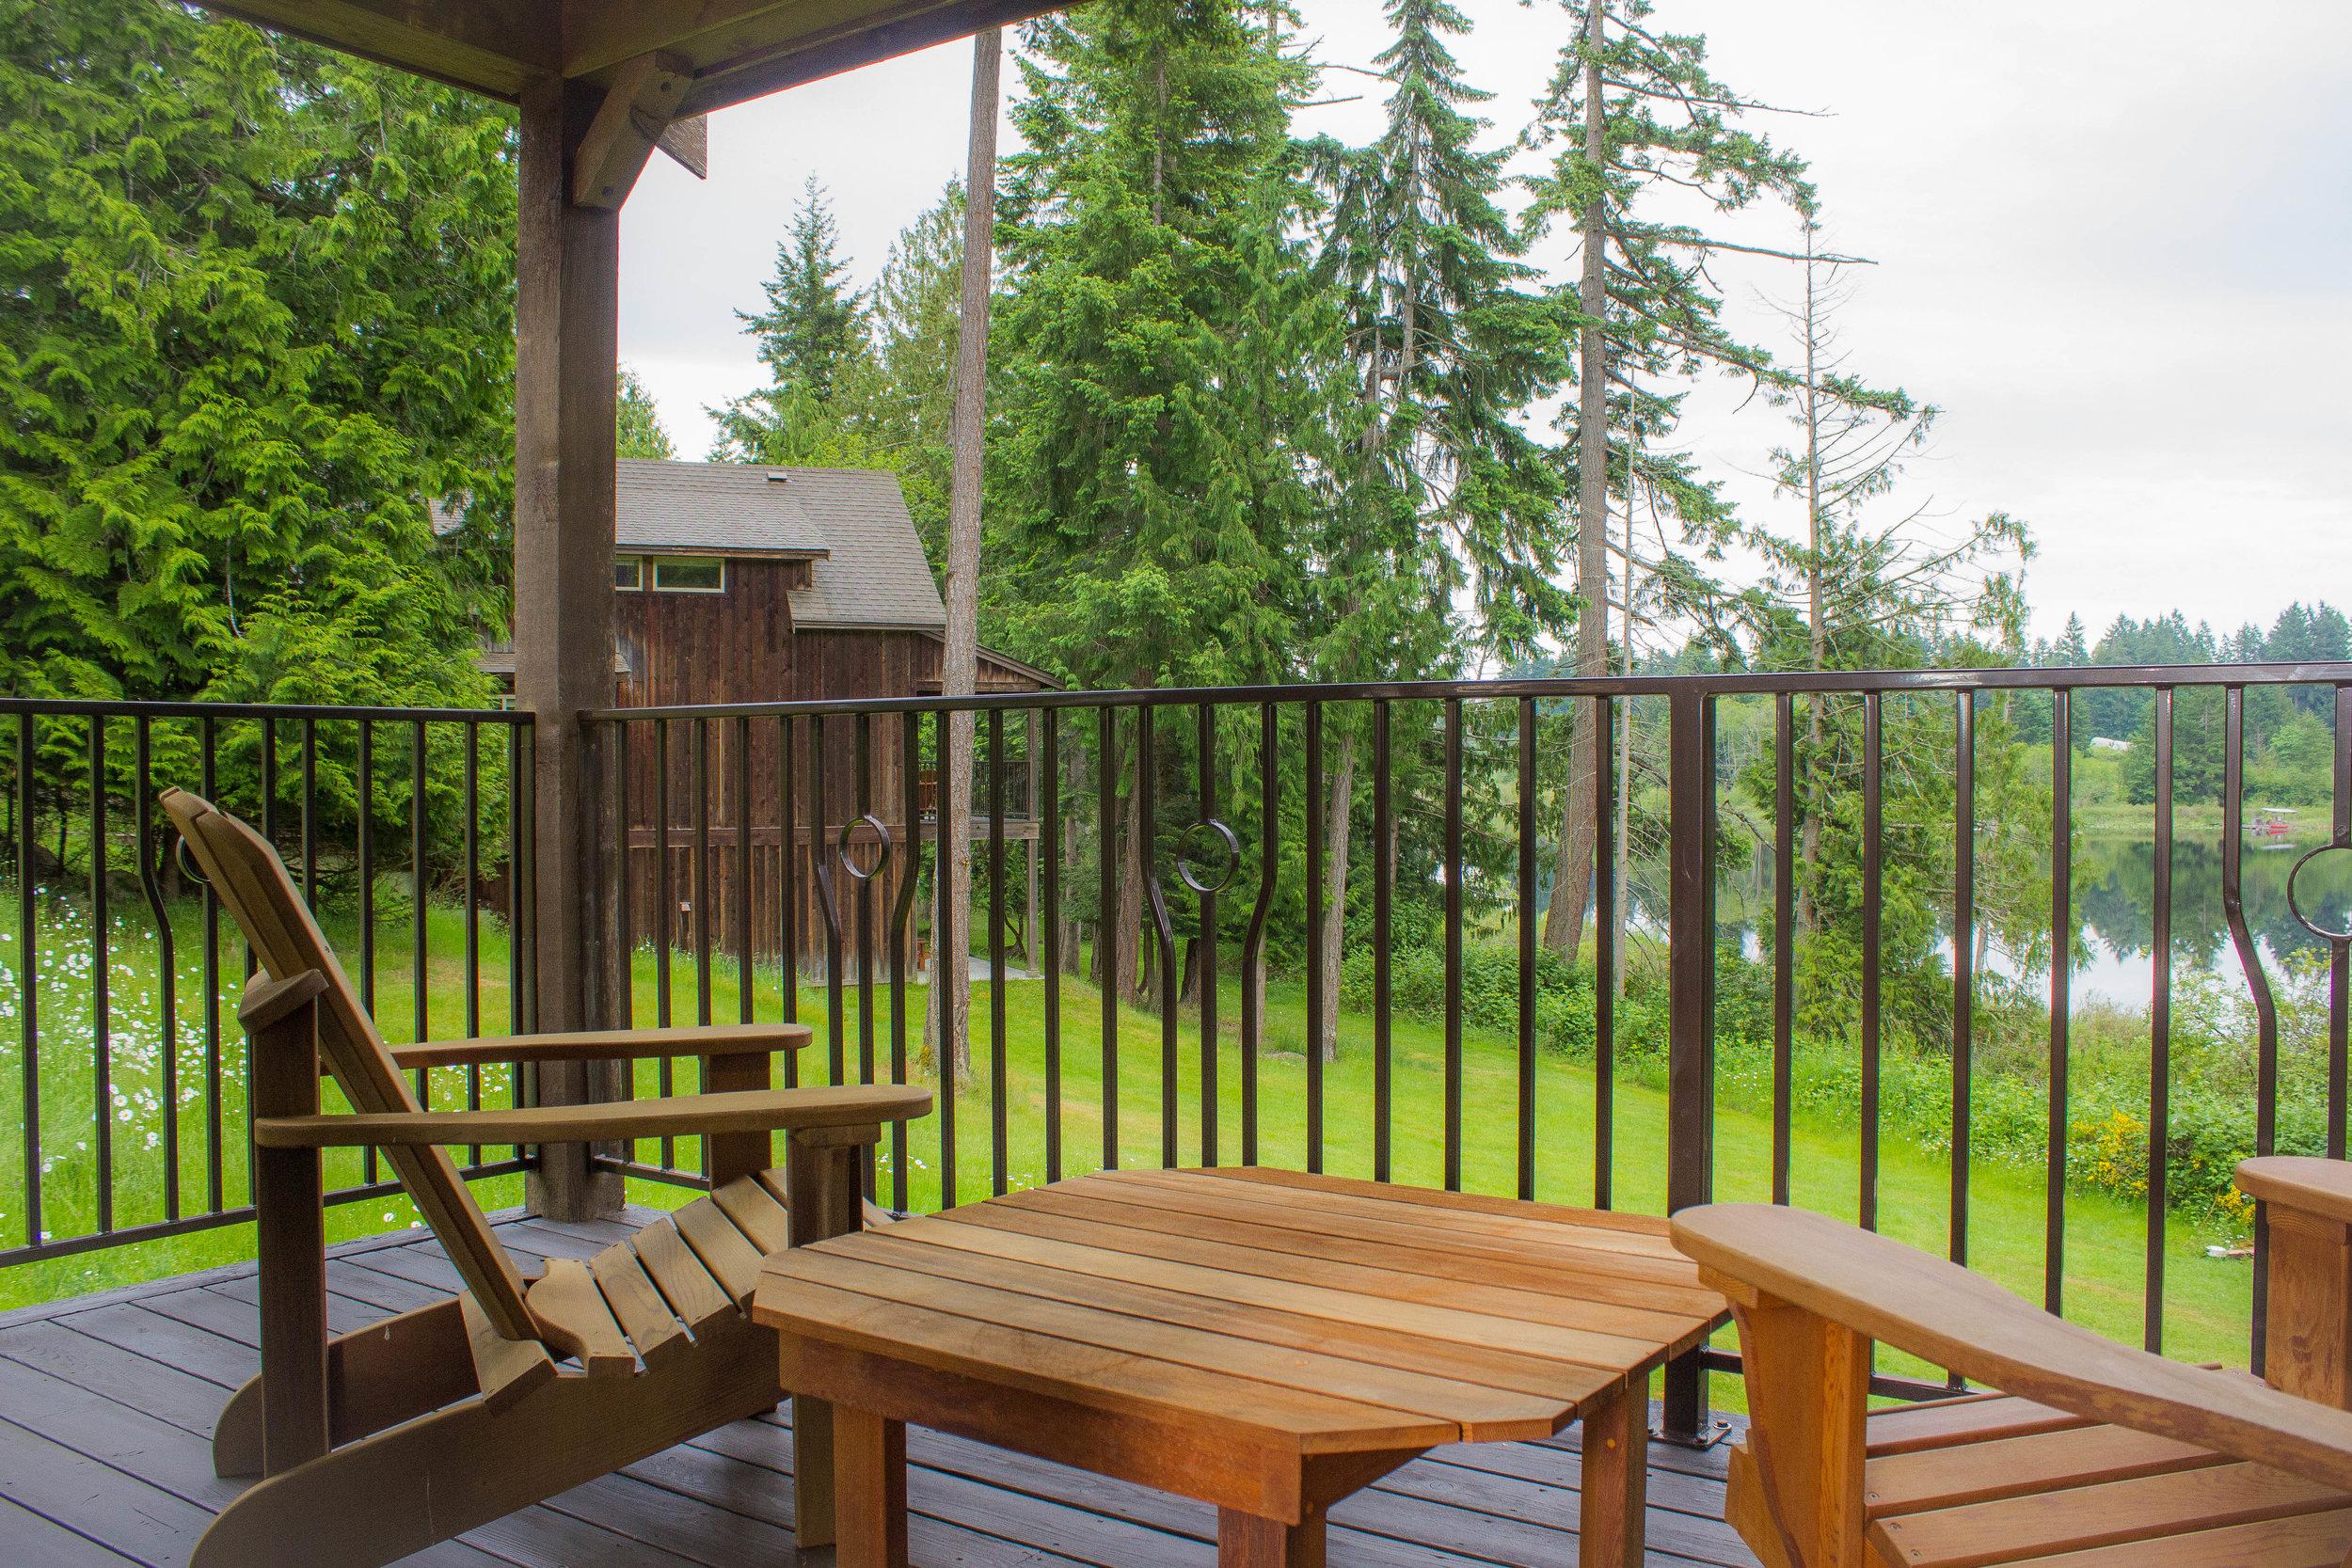 Cedar decks with custom metal railings and Adirondack chairs